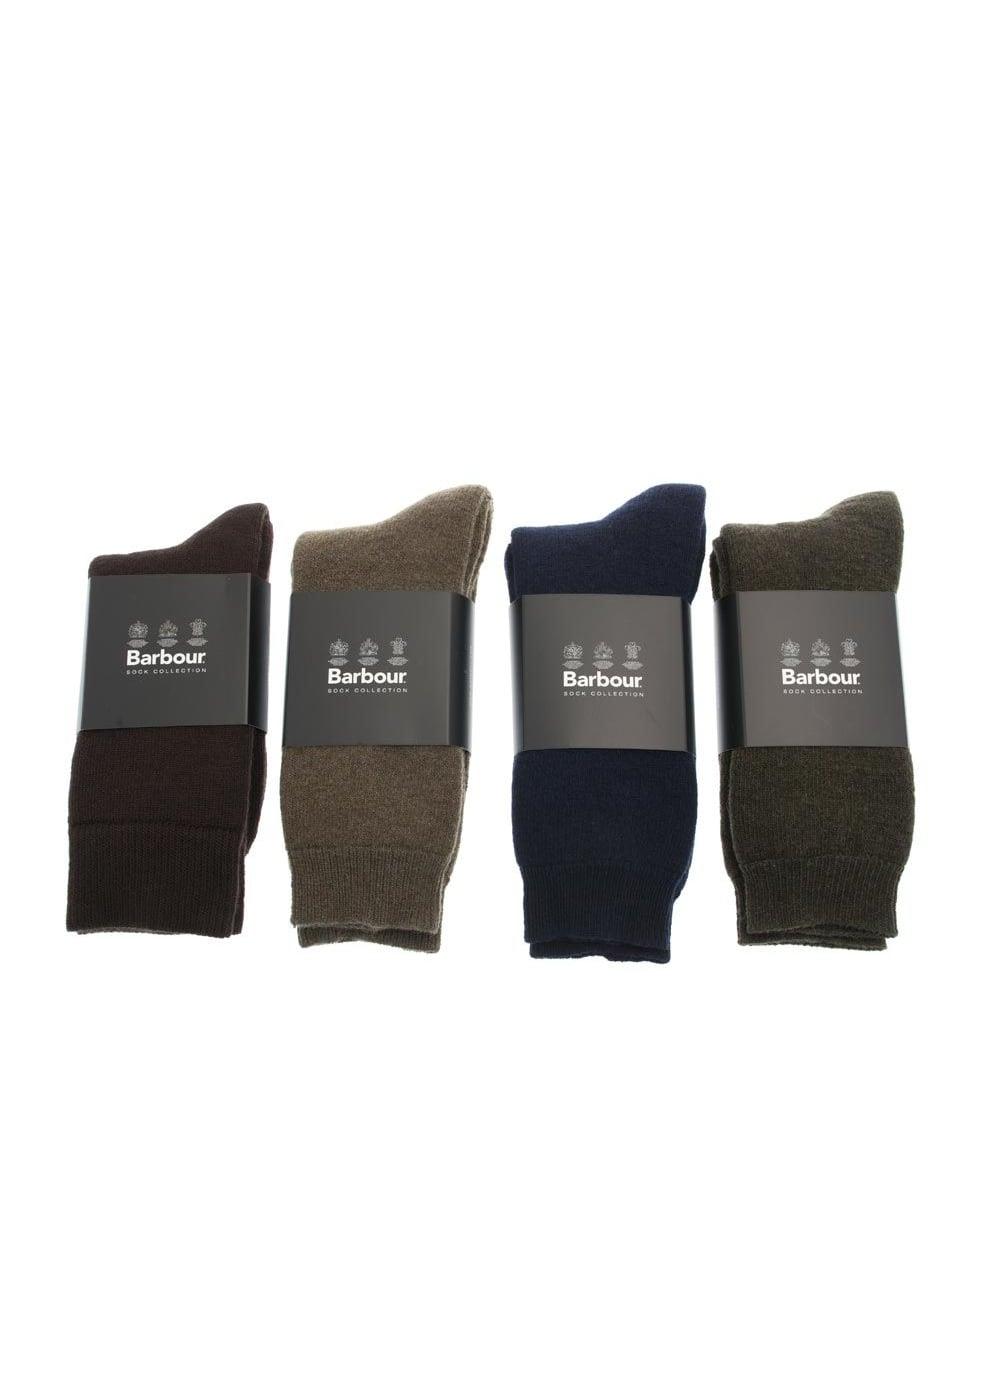 limited guantity watch exquisite design Barbour Wellington Calf Socks